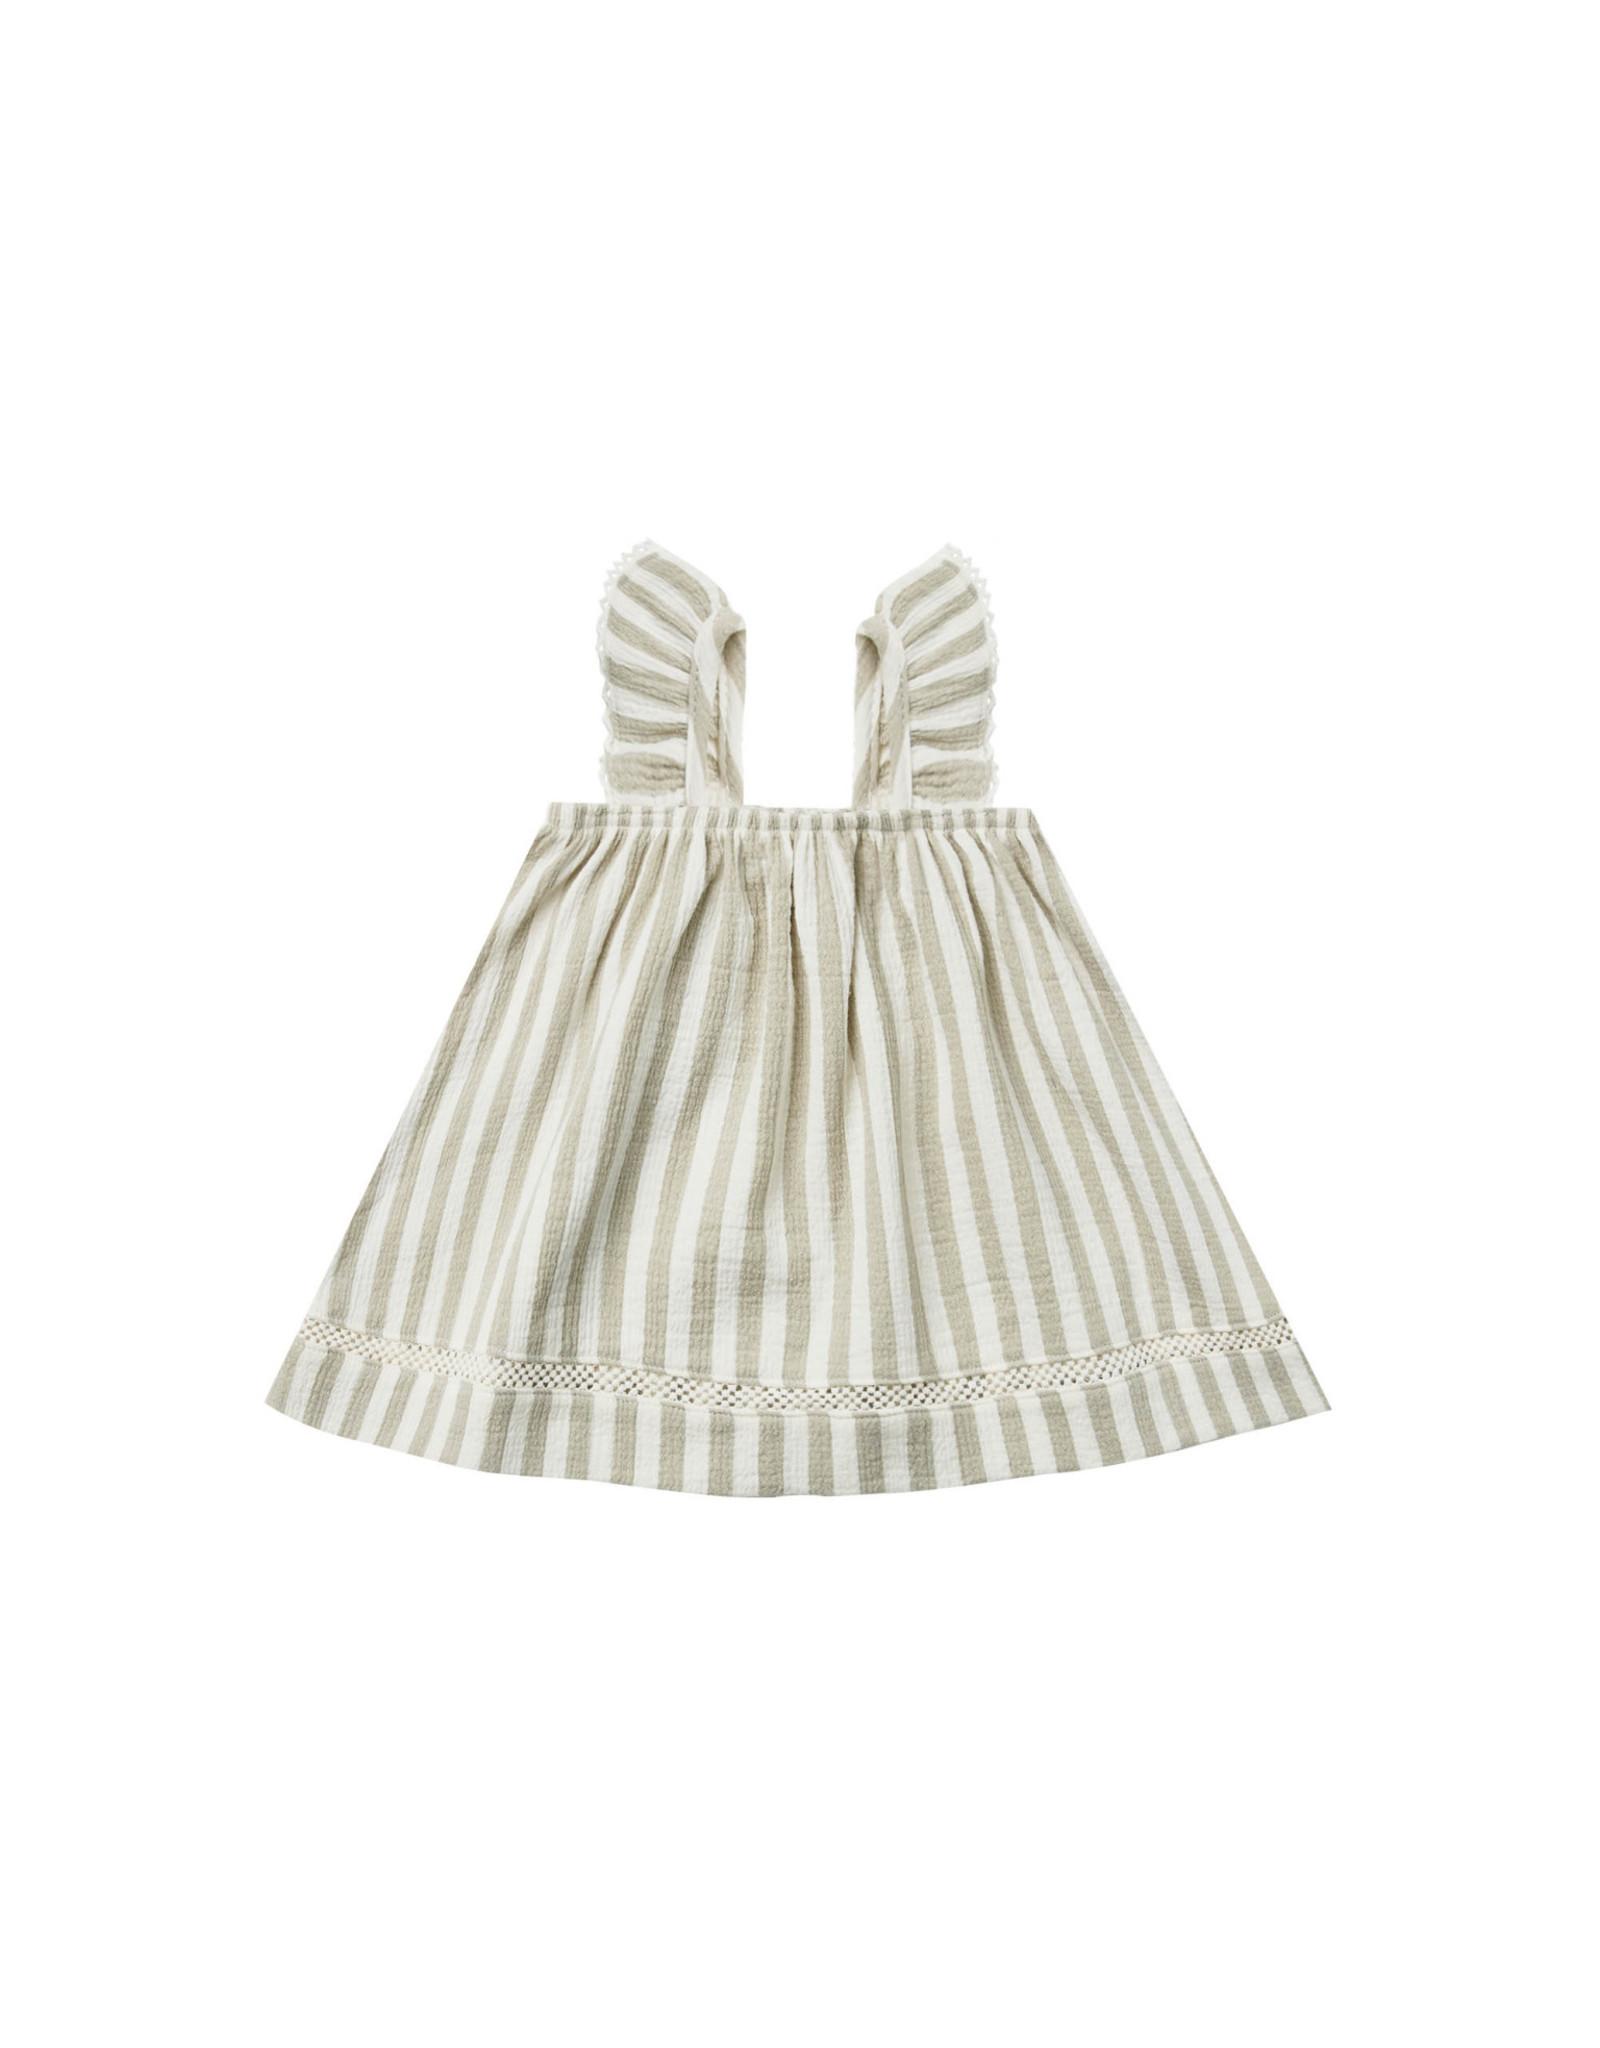 Quincy Mae Quincy Mae Woven Ruffle Tube Dress, Sage Stripe